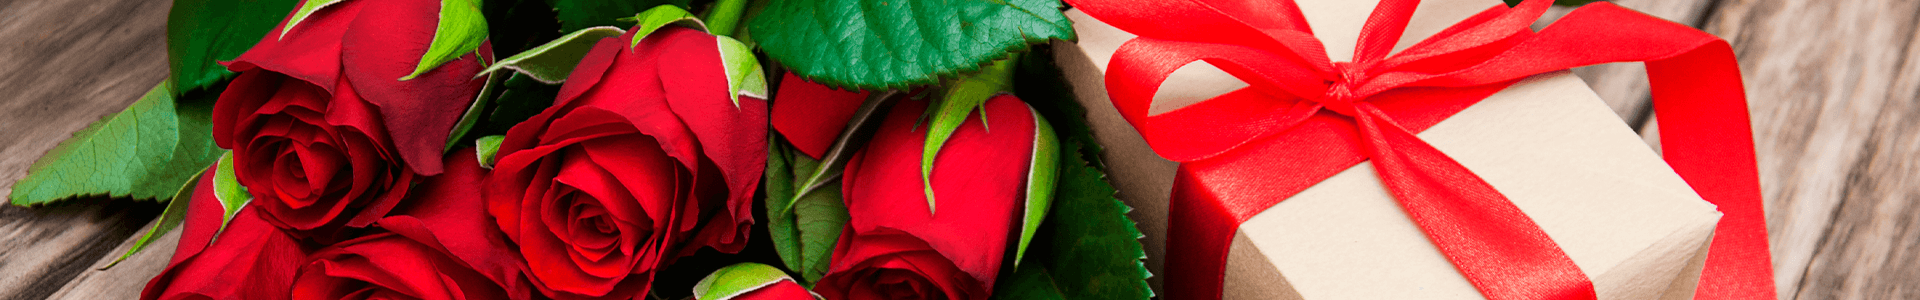 [DESKTOP] - Banner - Flores